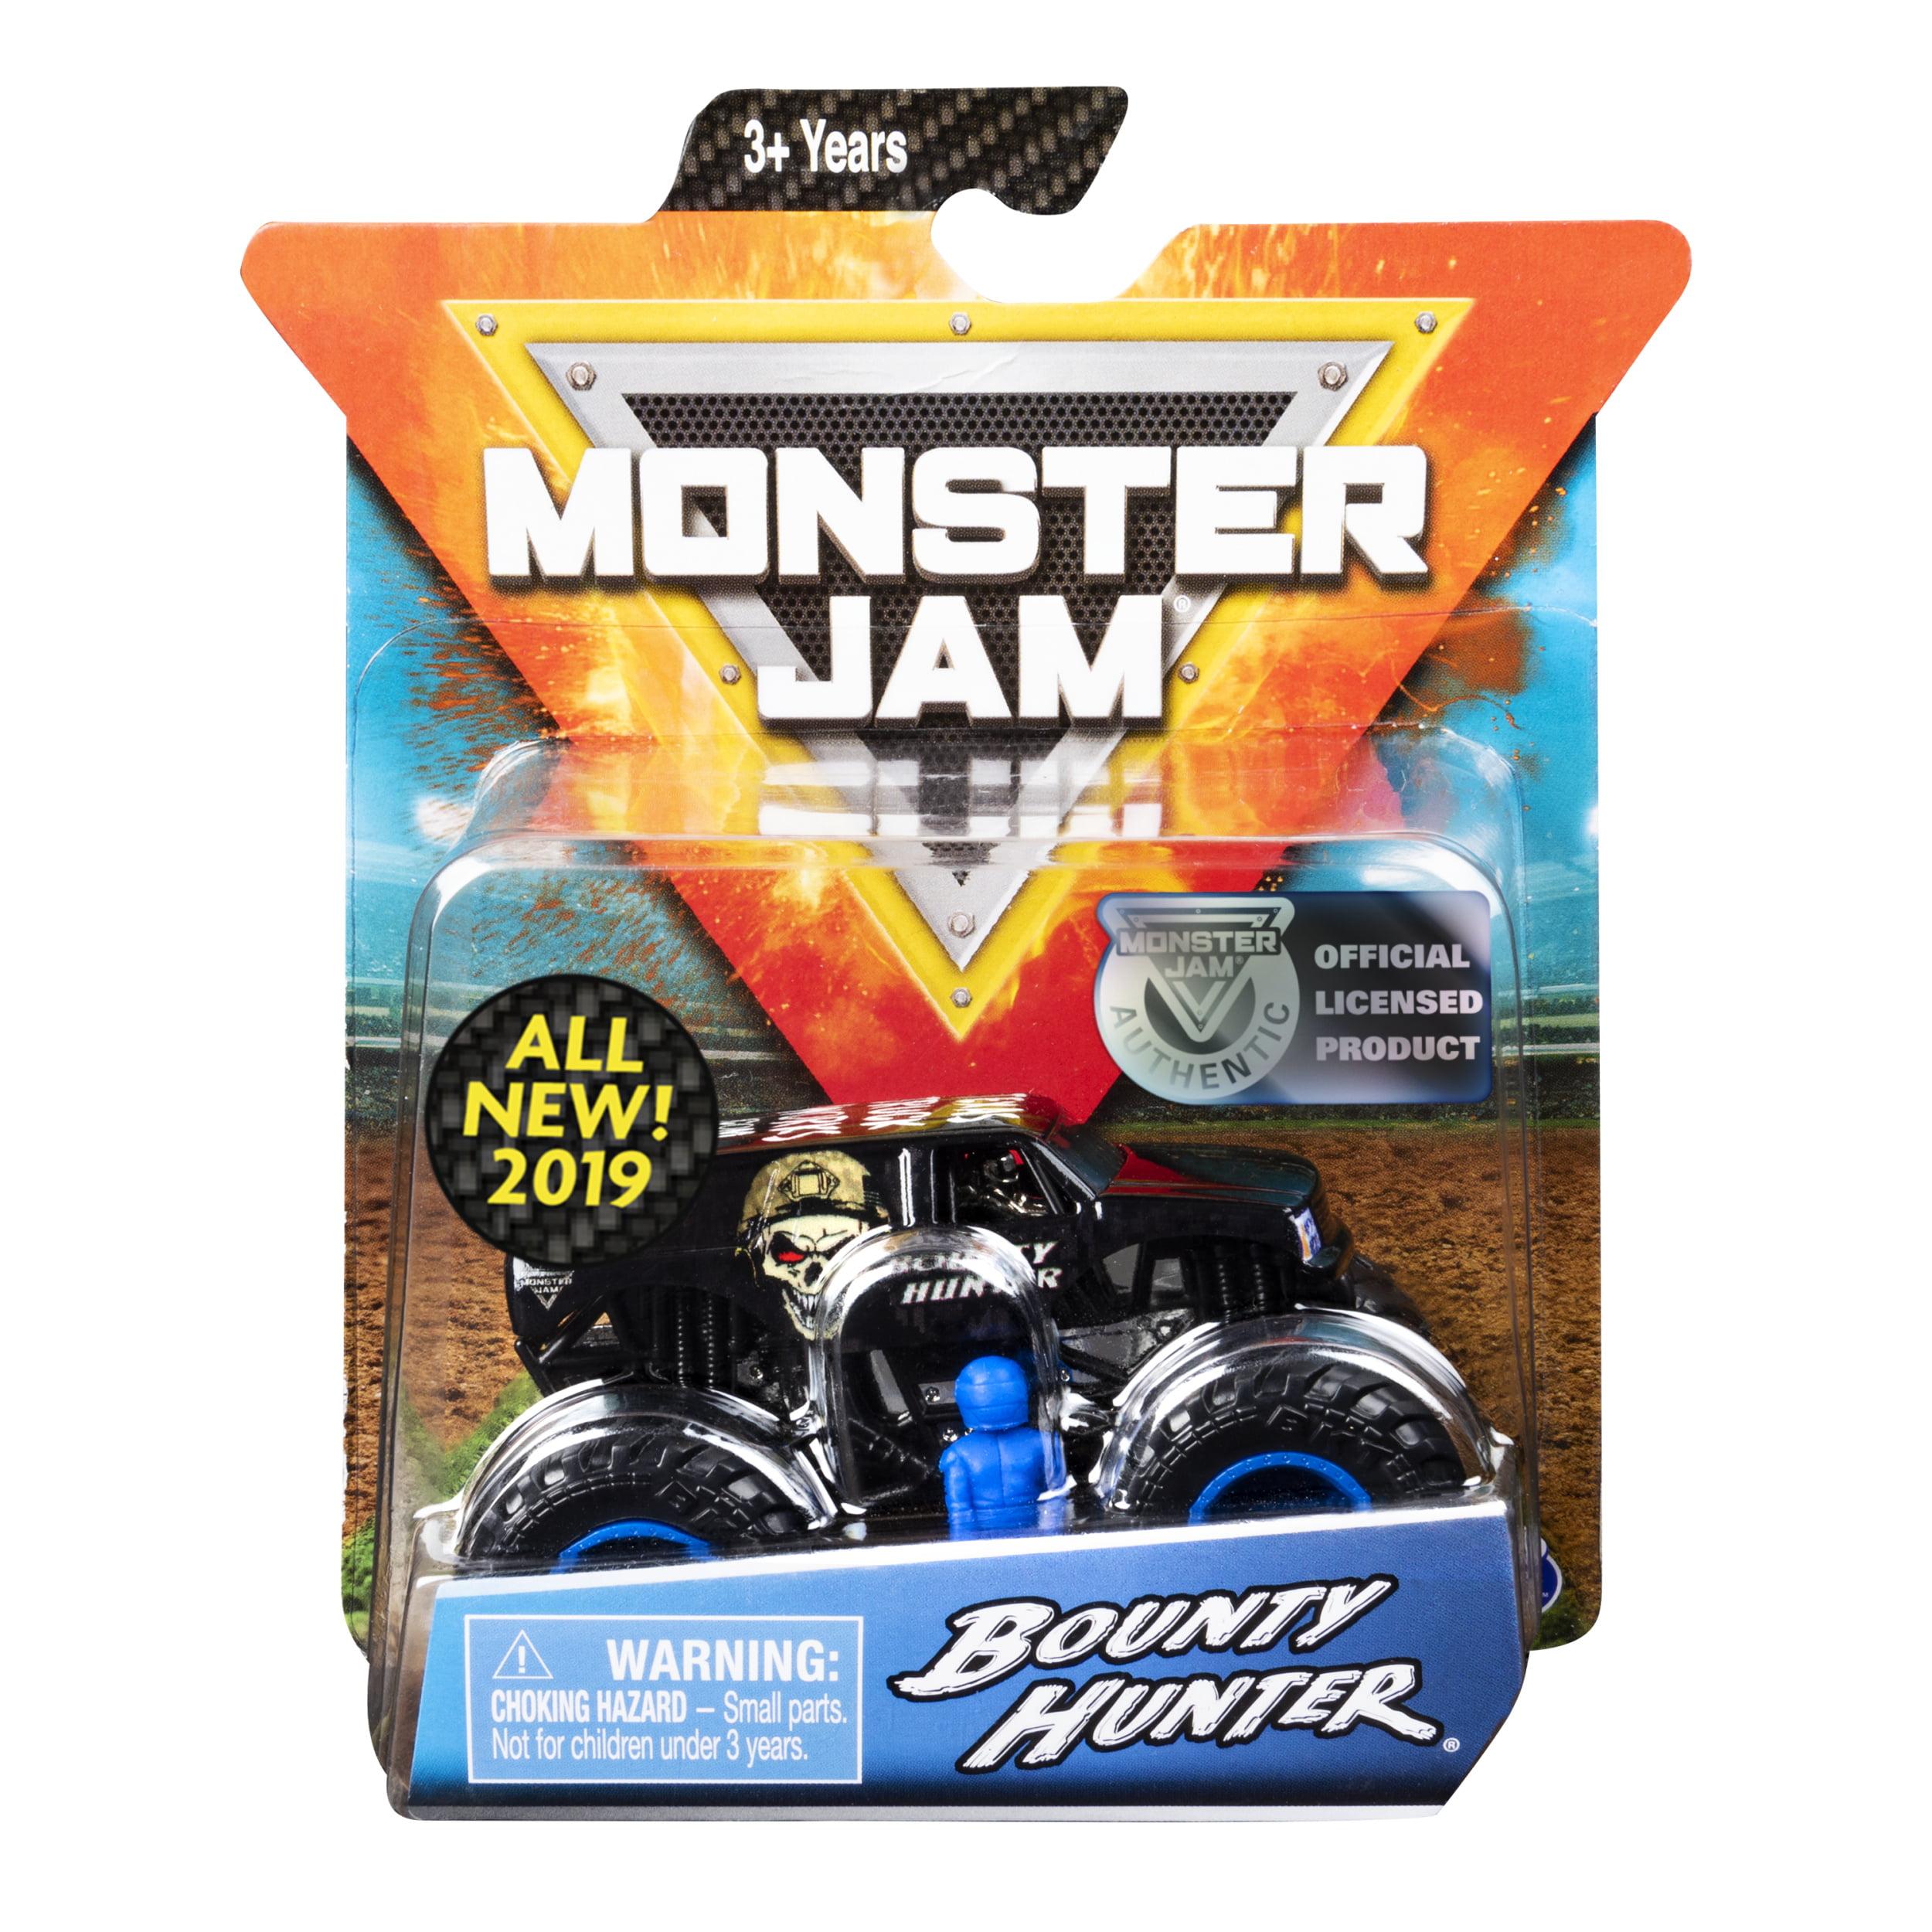 Monster Jam, Official Bounty Hunter Monster Truck, Die-Cast Vehicle, Arena Favorites Series, 1:64 Scale